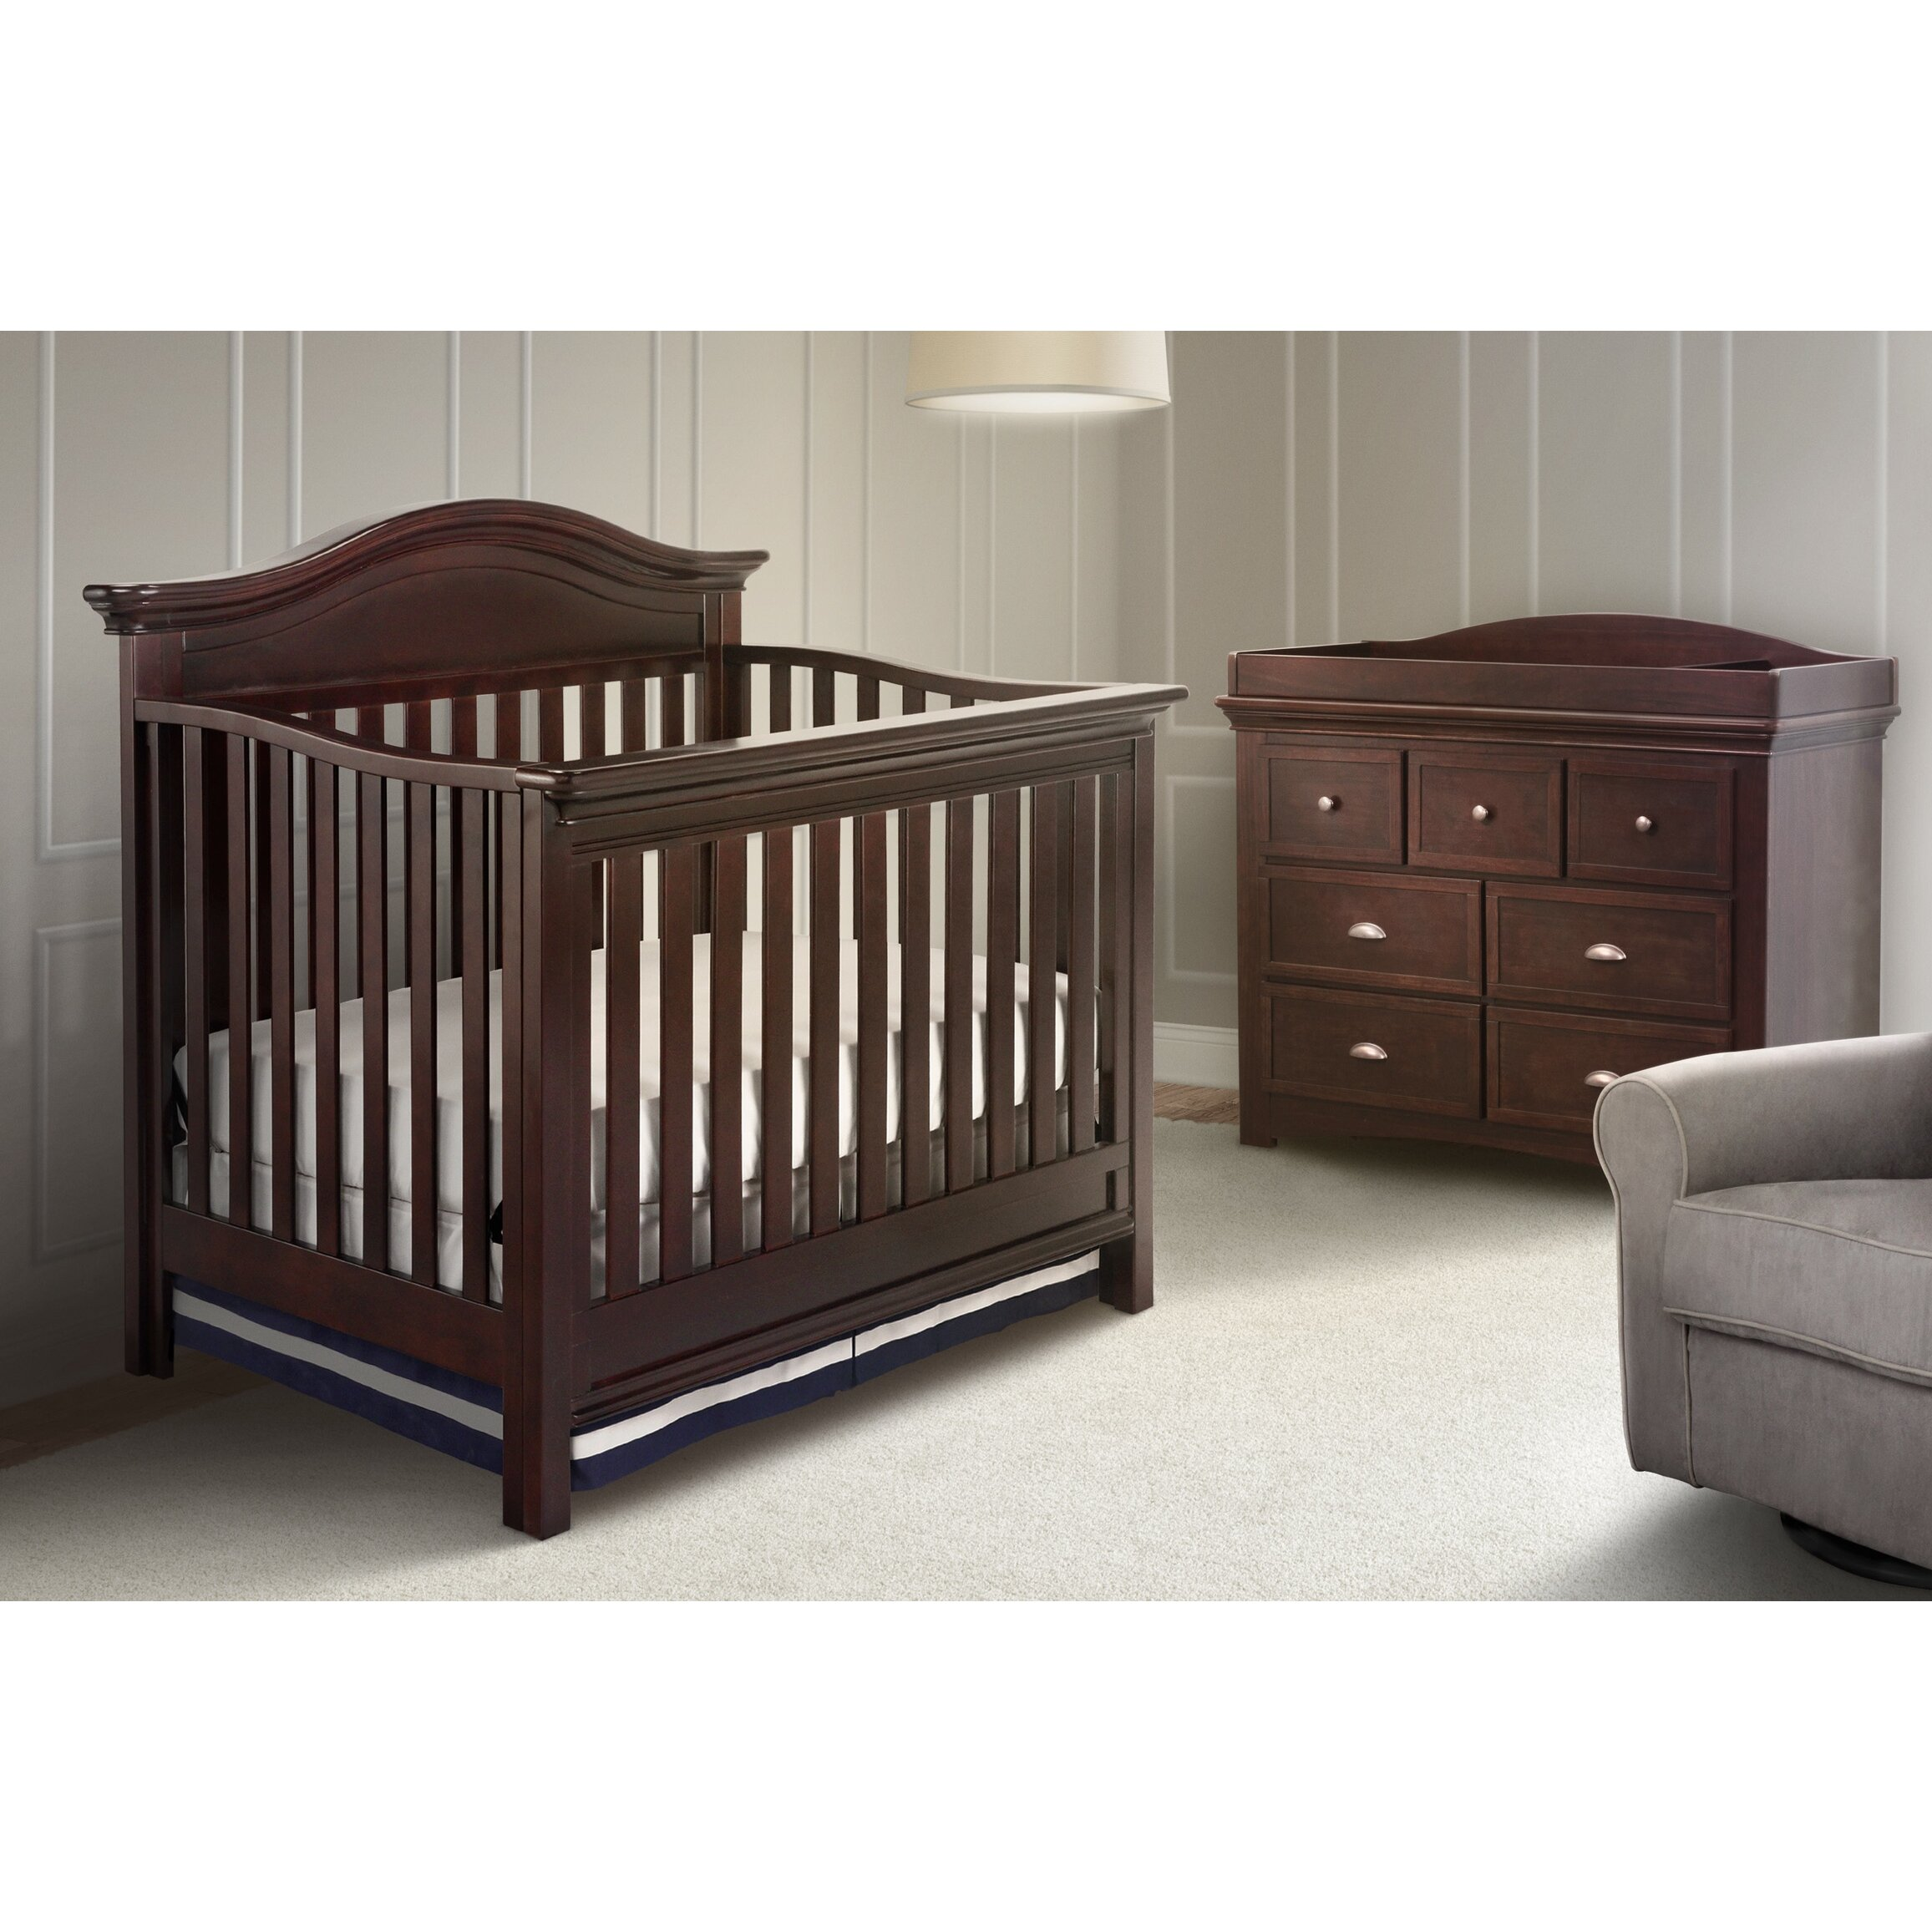 Baby cribs richmond va - Simmons Kids Slumber Time Augusta Molasses Crib N More